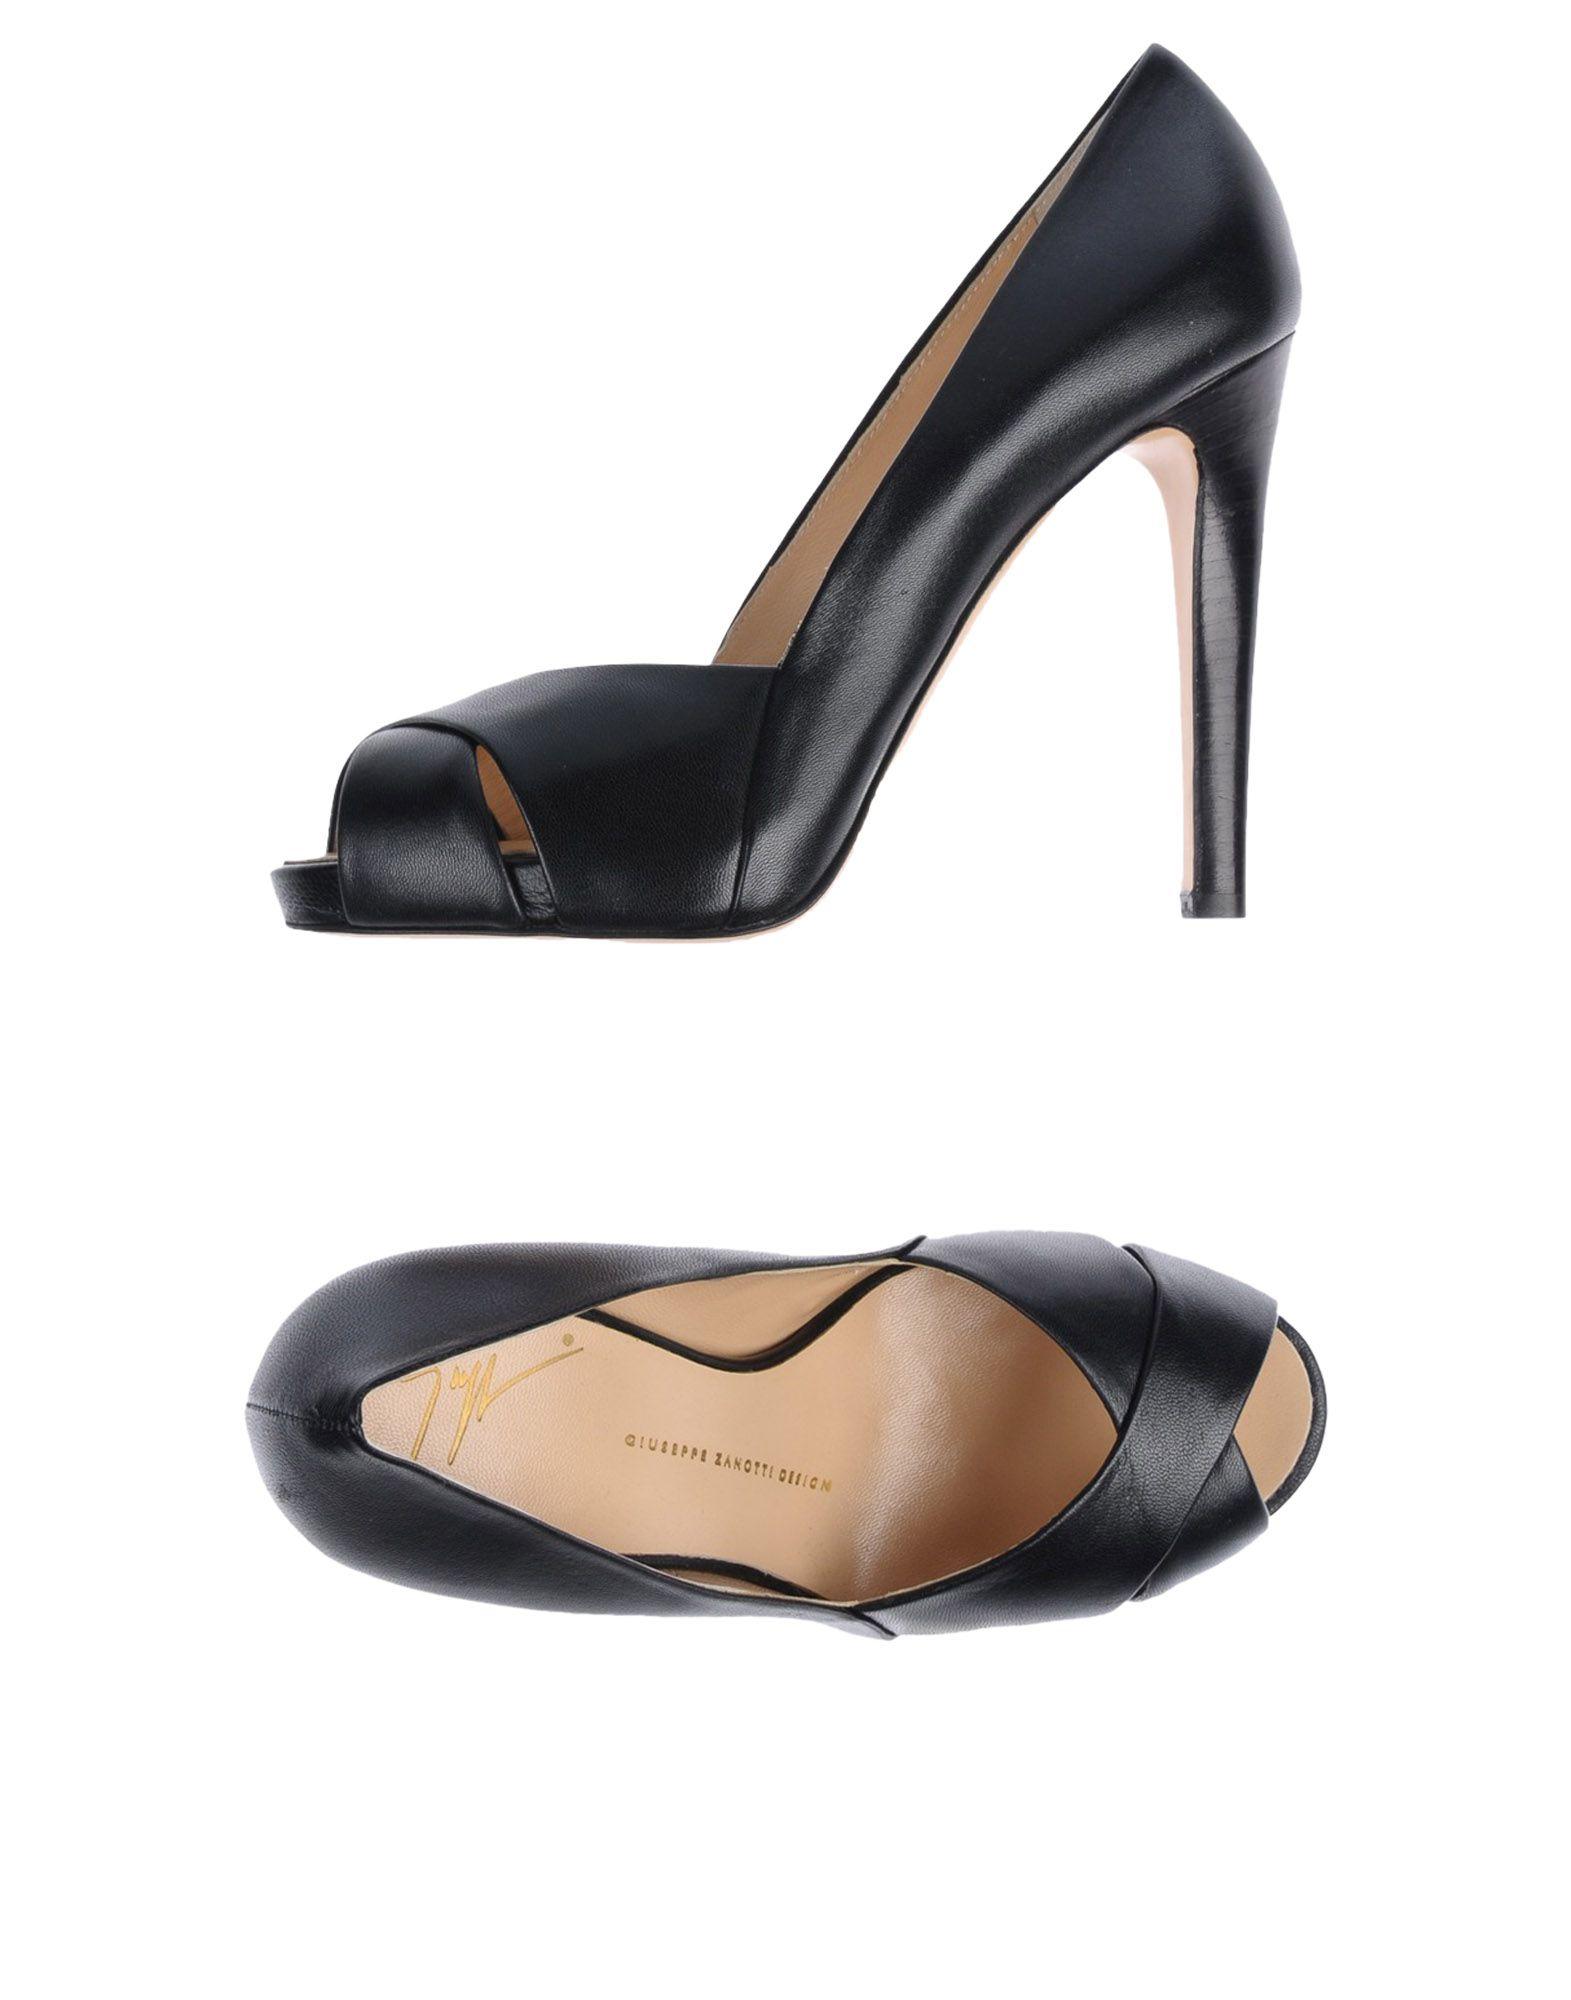 Giuseppe Zanotti Pumps Damen  11413917XHGut aussehende strapazierfähige Schuhe